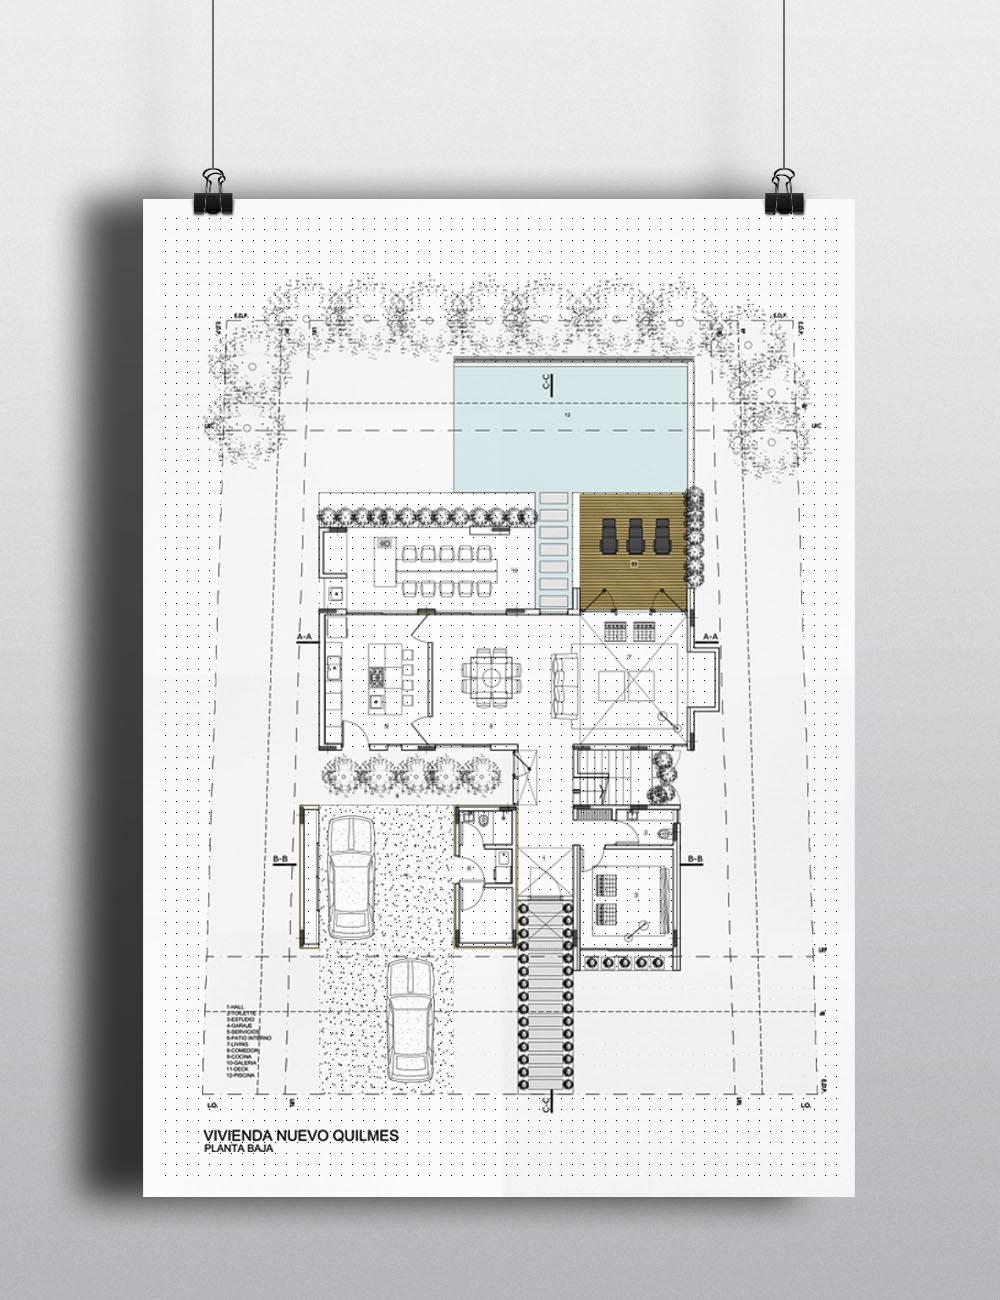 Arquitecta e interiorista romina calziwww.rominacalzi.comromina calzi